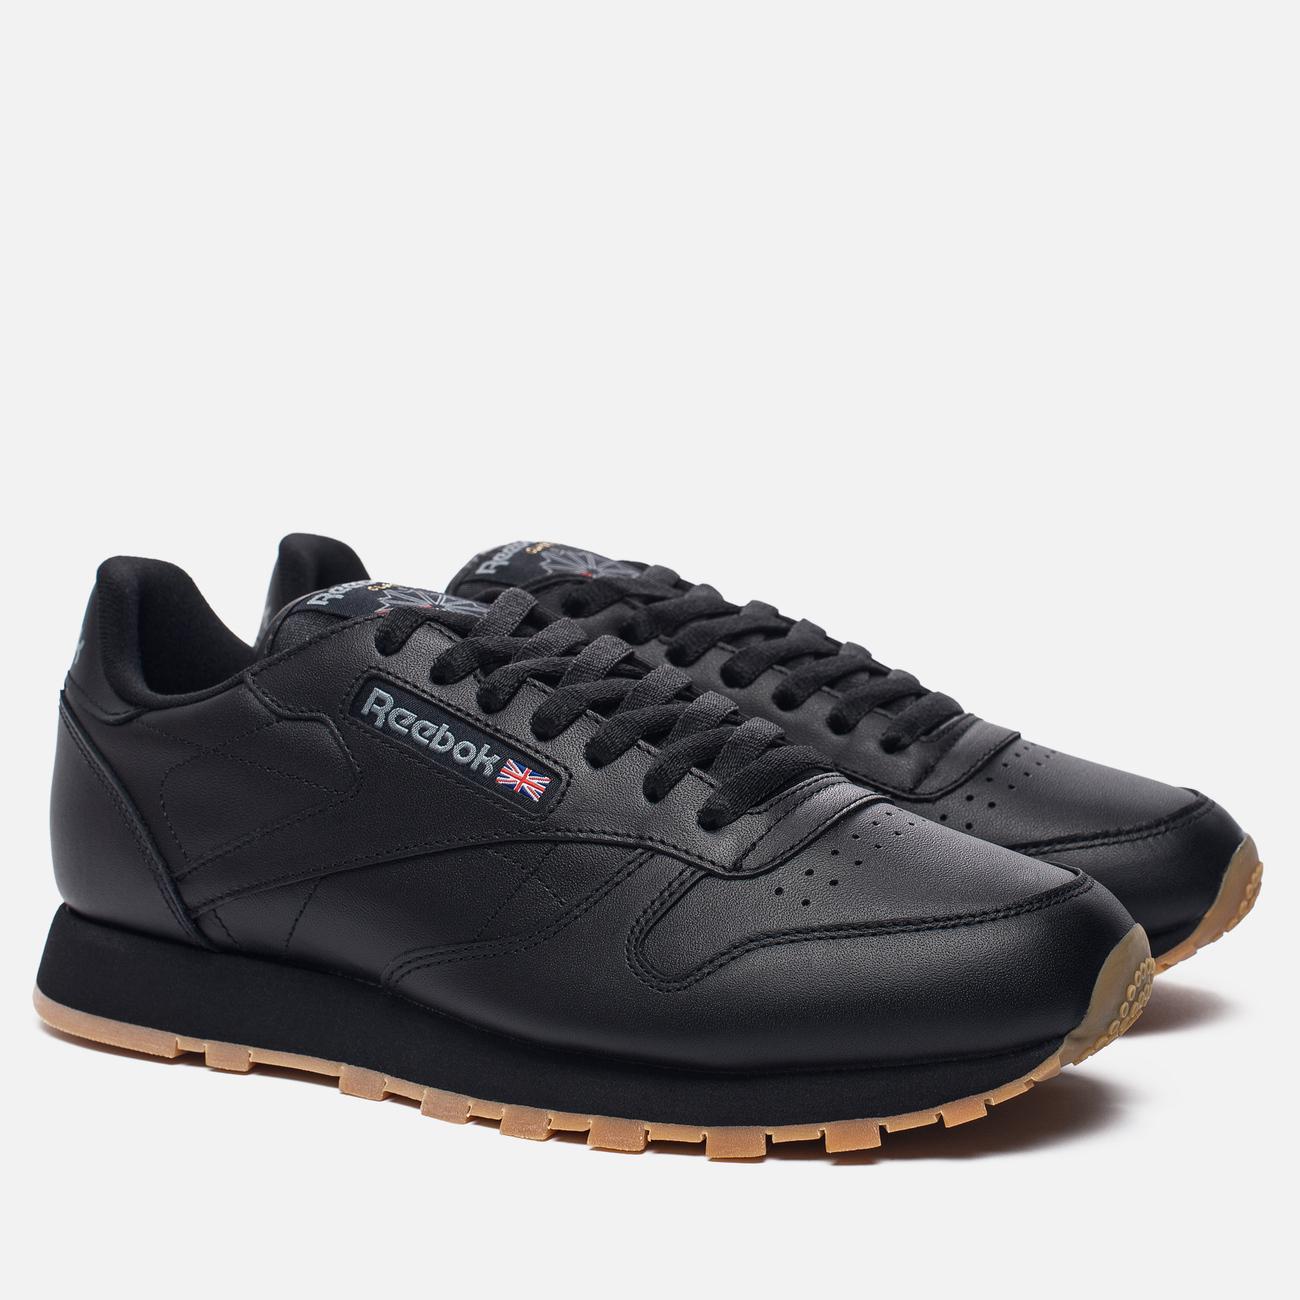 Кроссовки Reebok Classic Leather Black/Gum